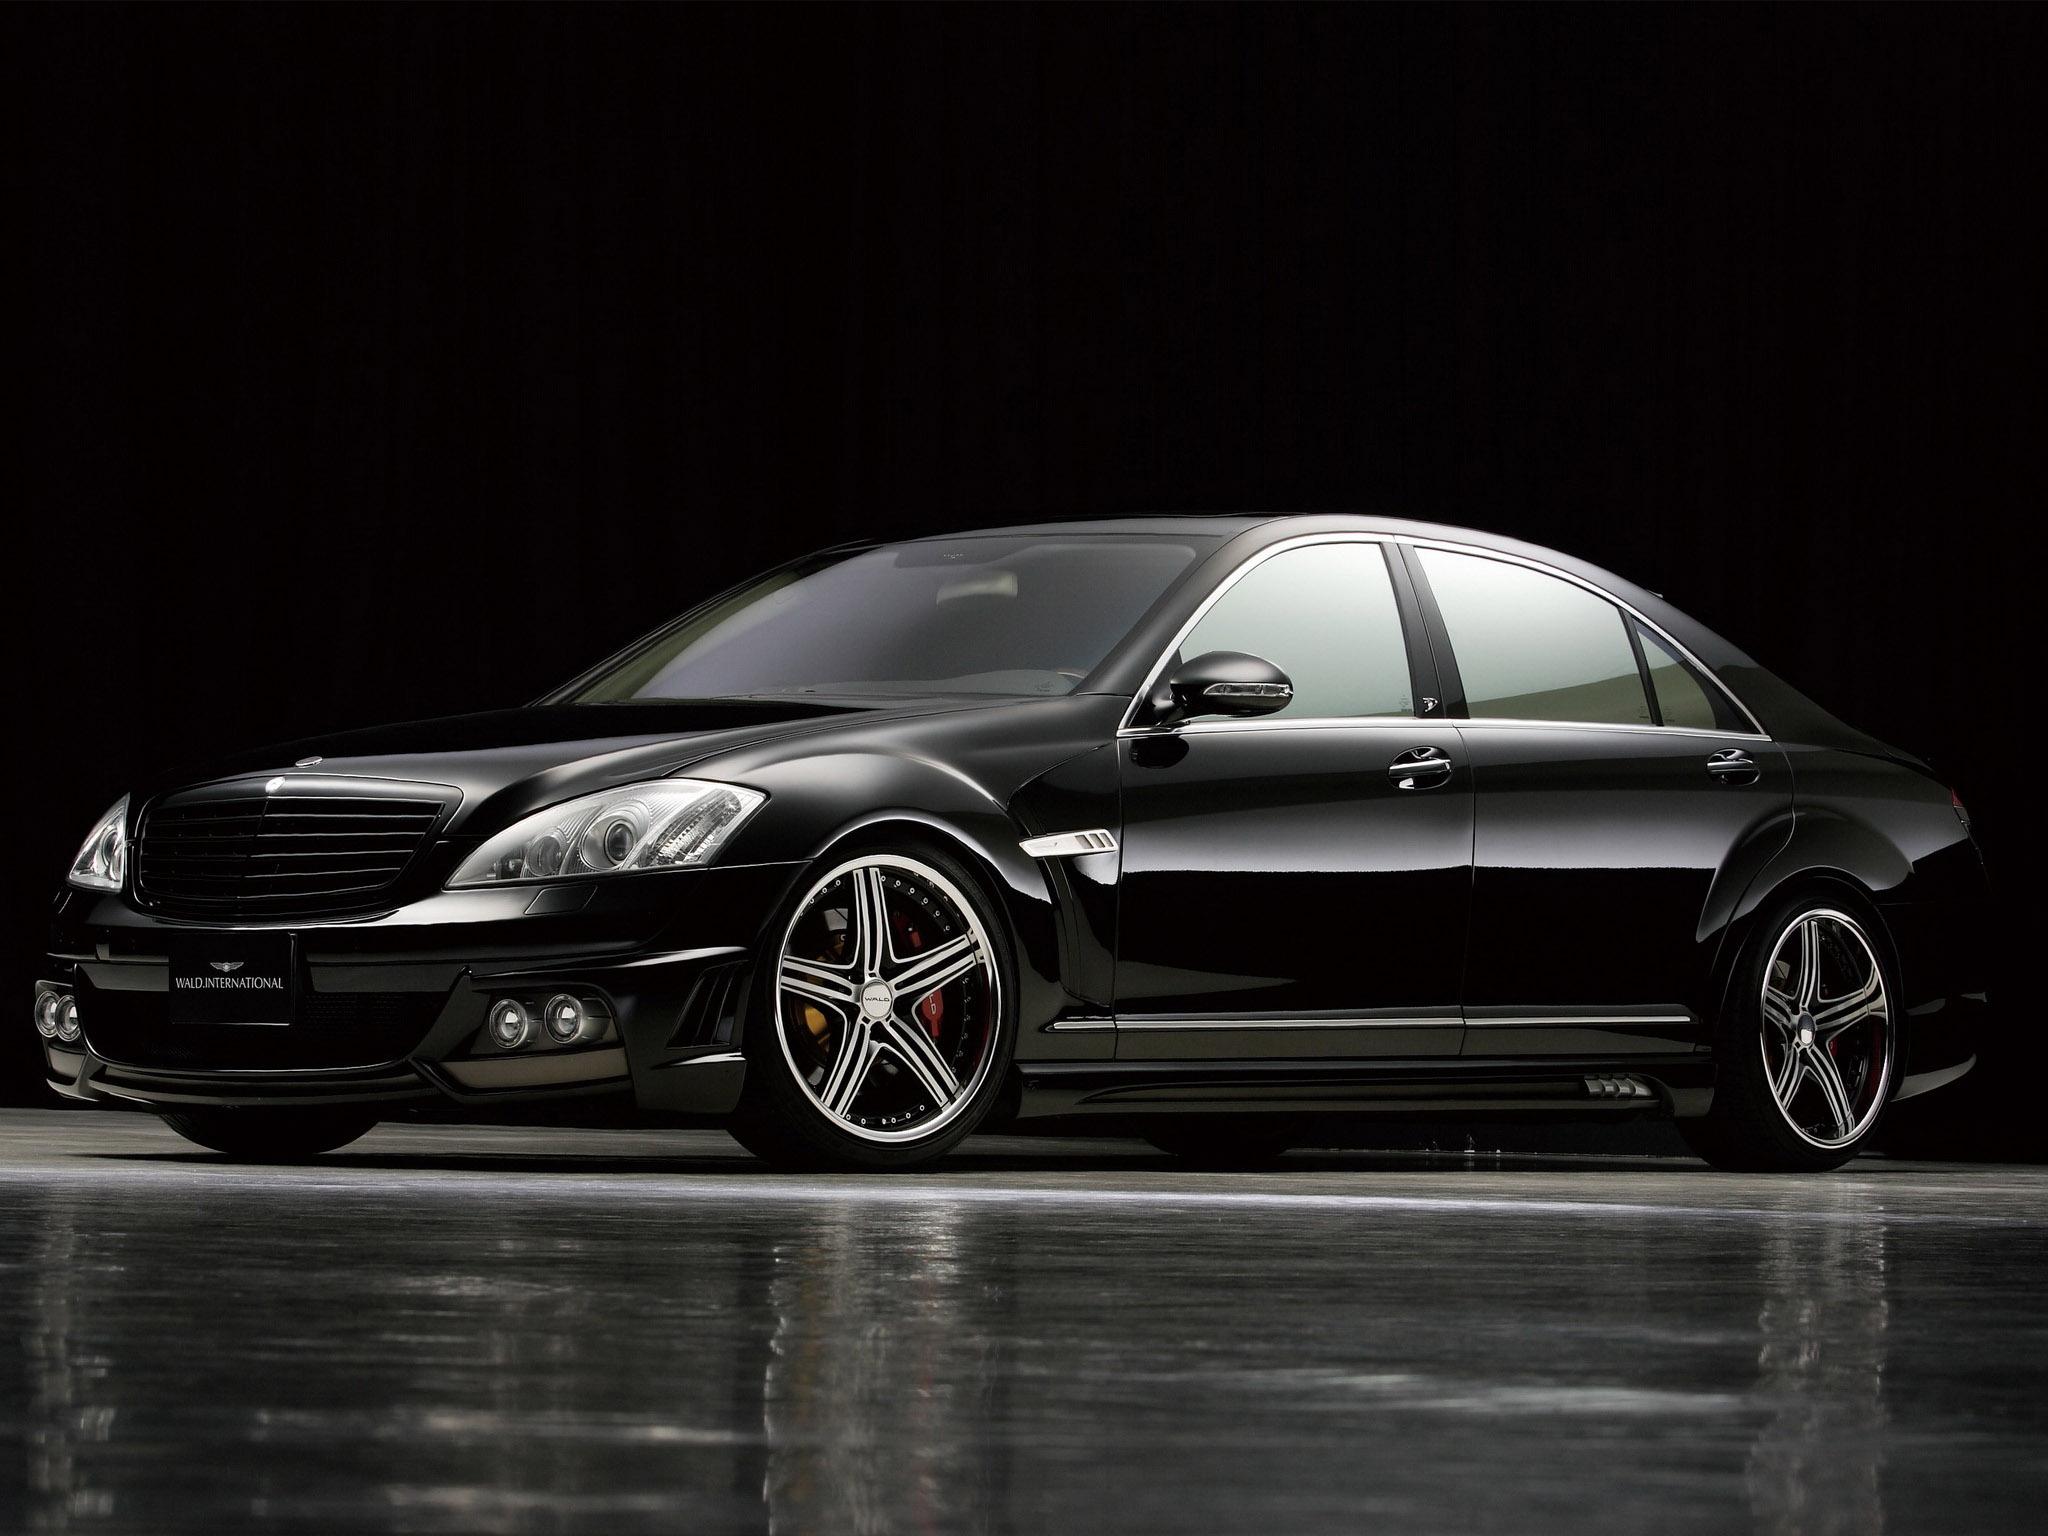 Wallpaper : Mercedes Benz, sports car, Sedan, netcarshow ...